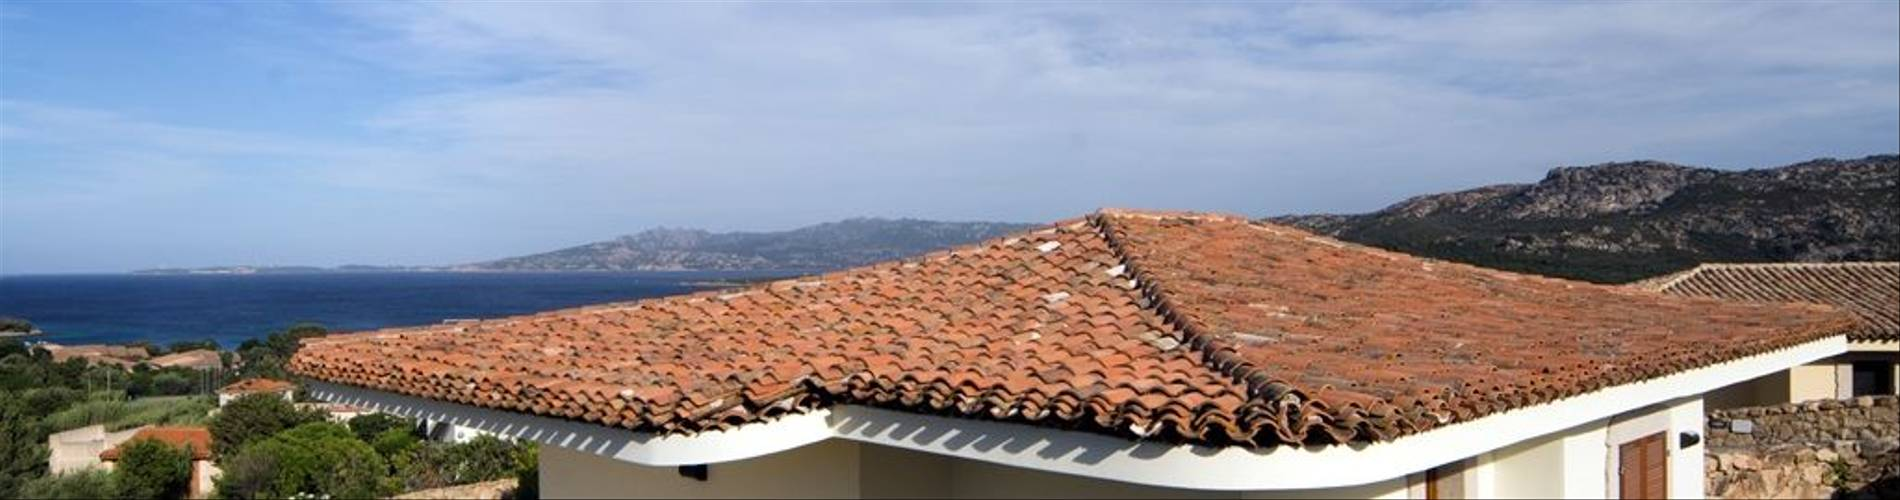 Le Saline, Sardinia, Italy, Villa V6 (22).jpg